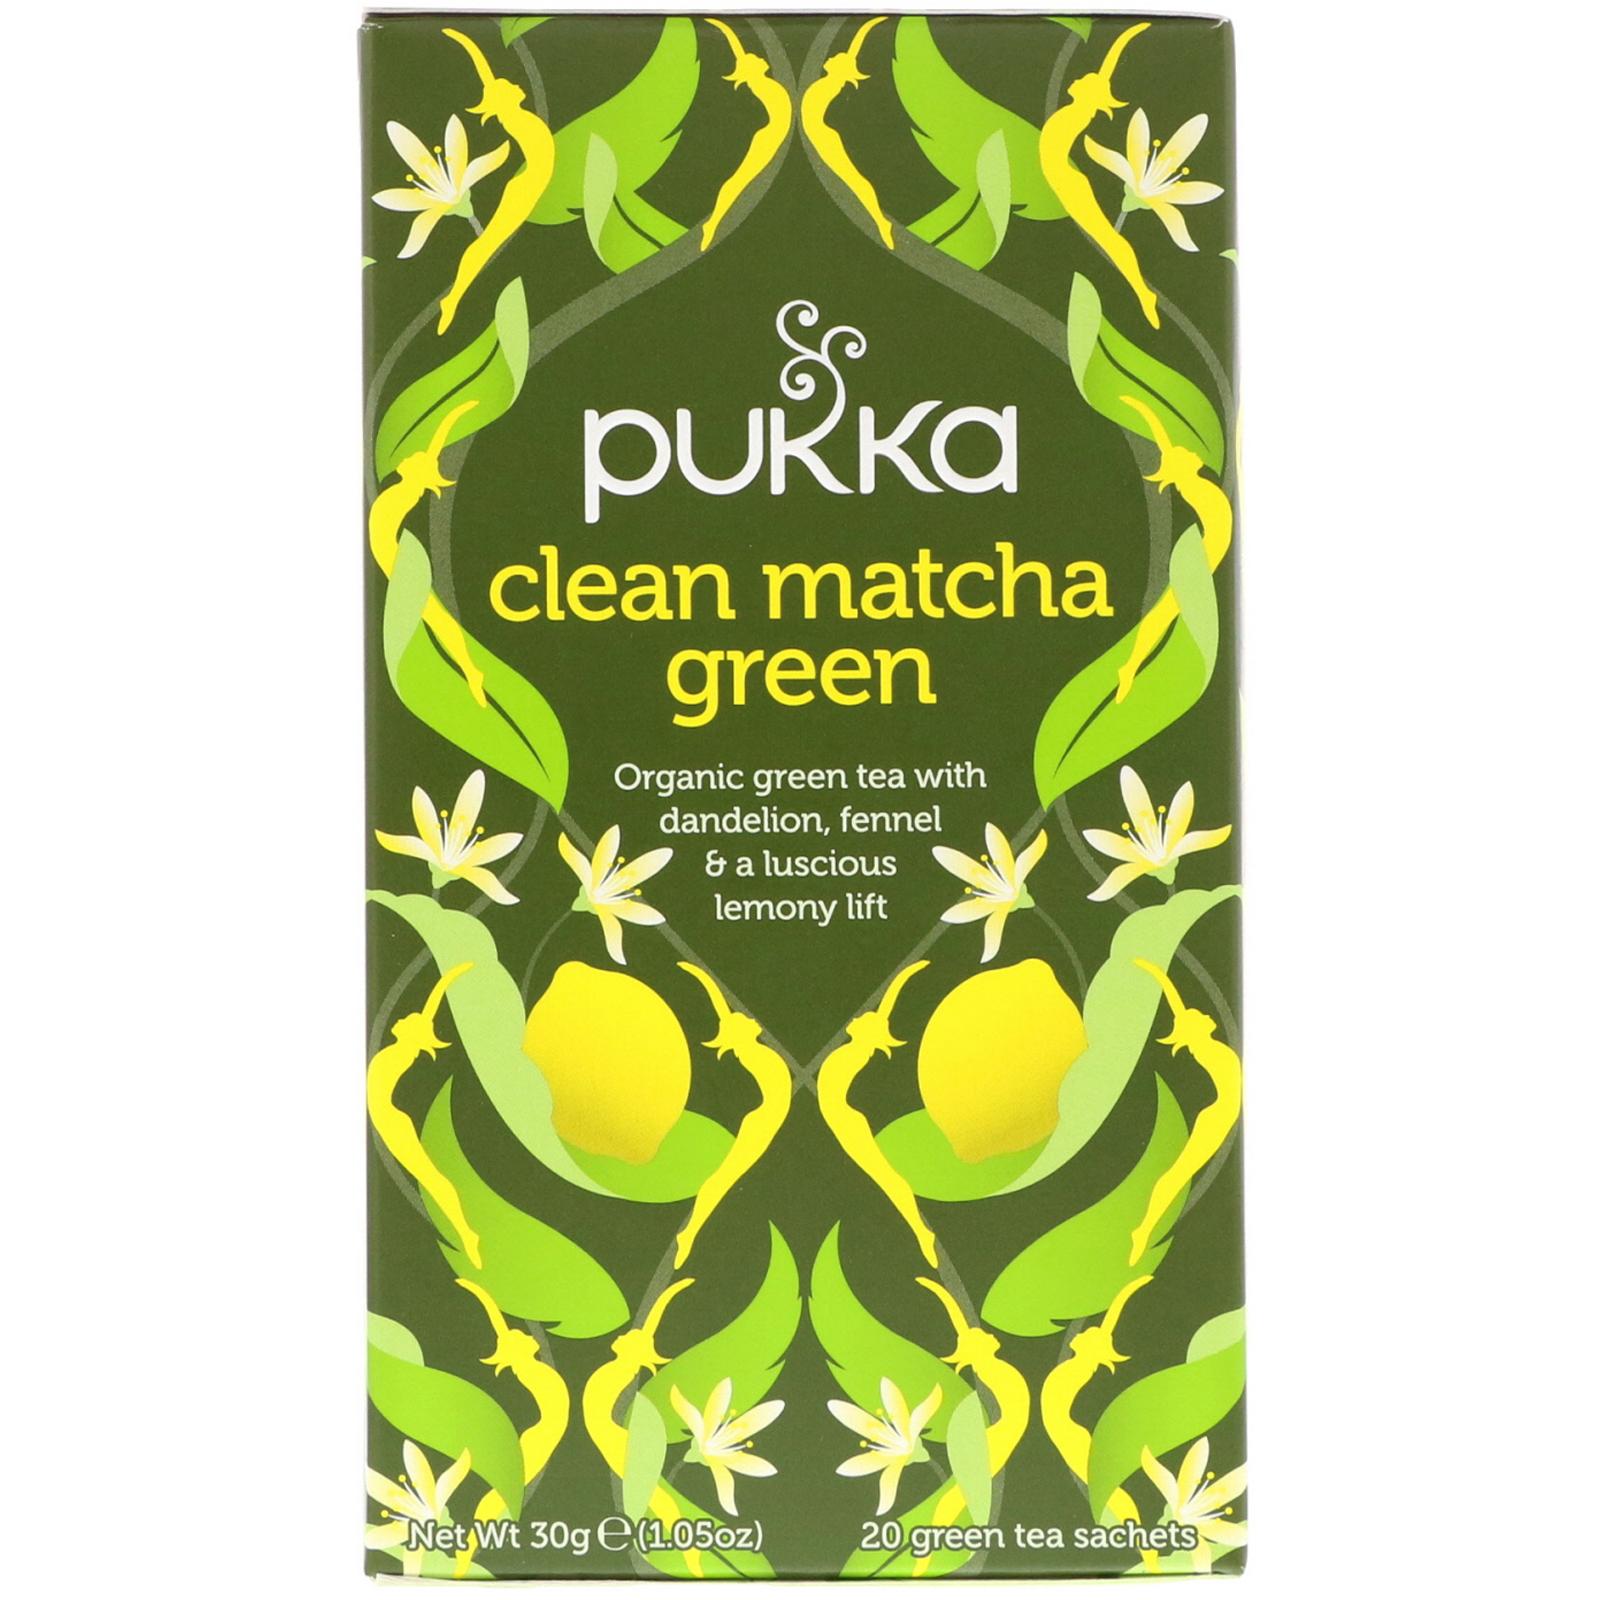 Pukka Herbs, Clean Matcha Green, 20 Green Tea Sachets, 0 05